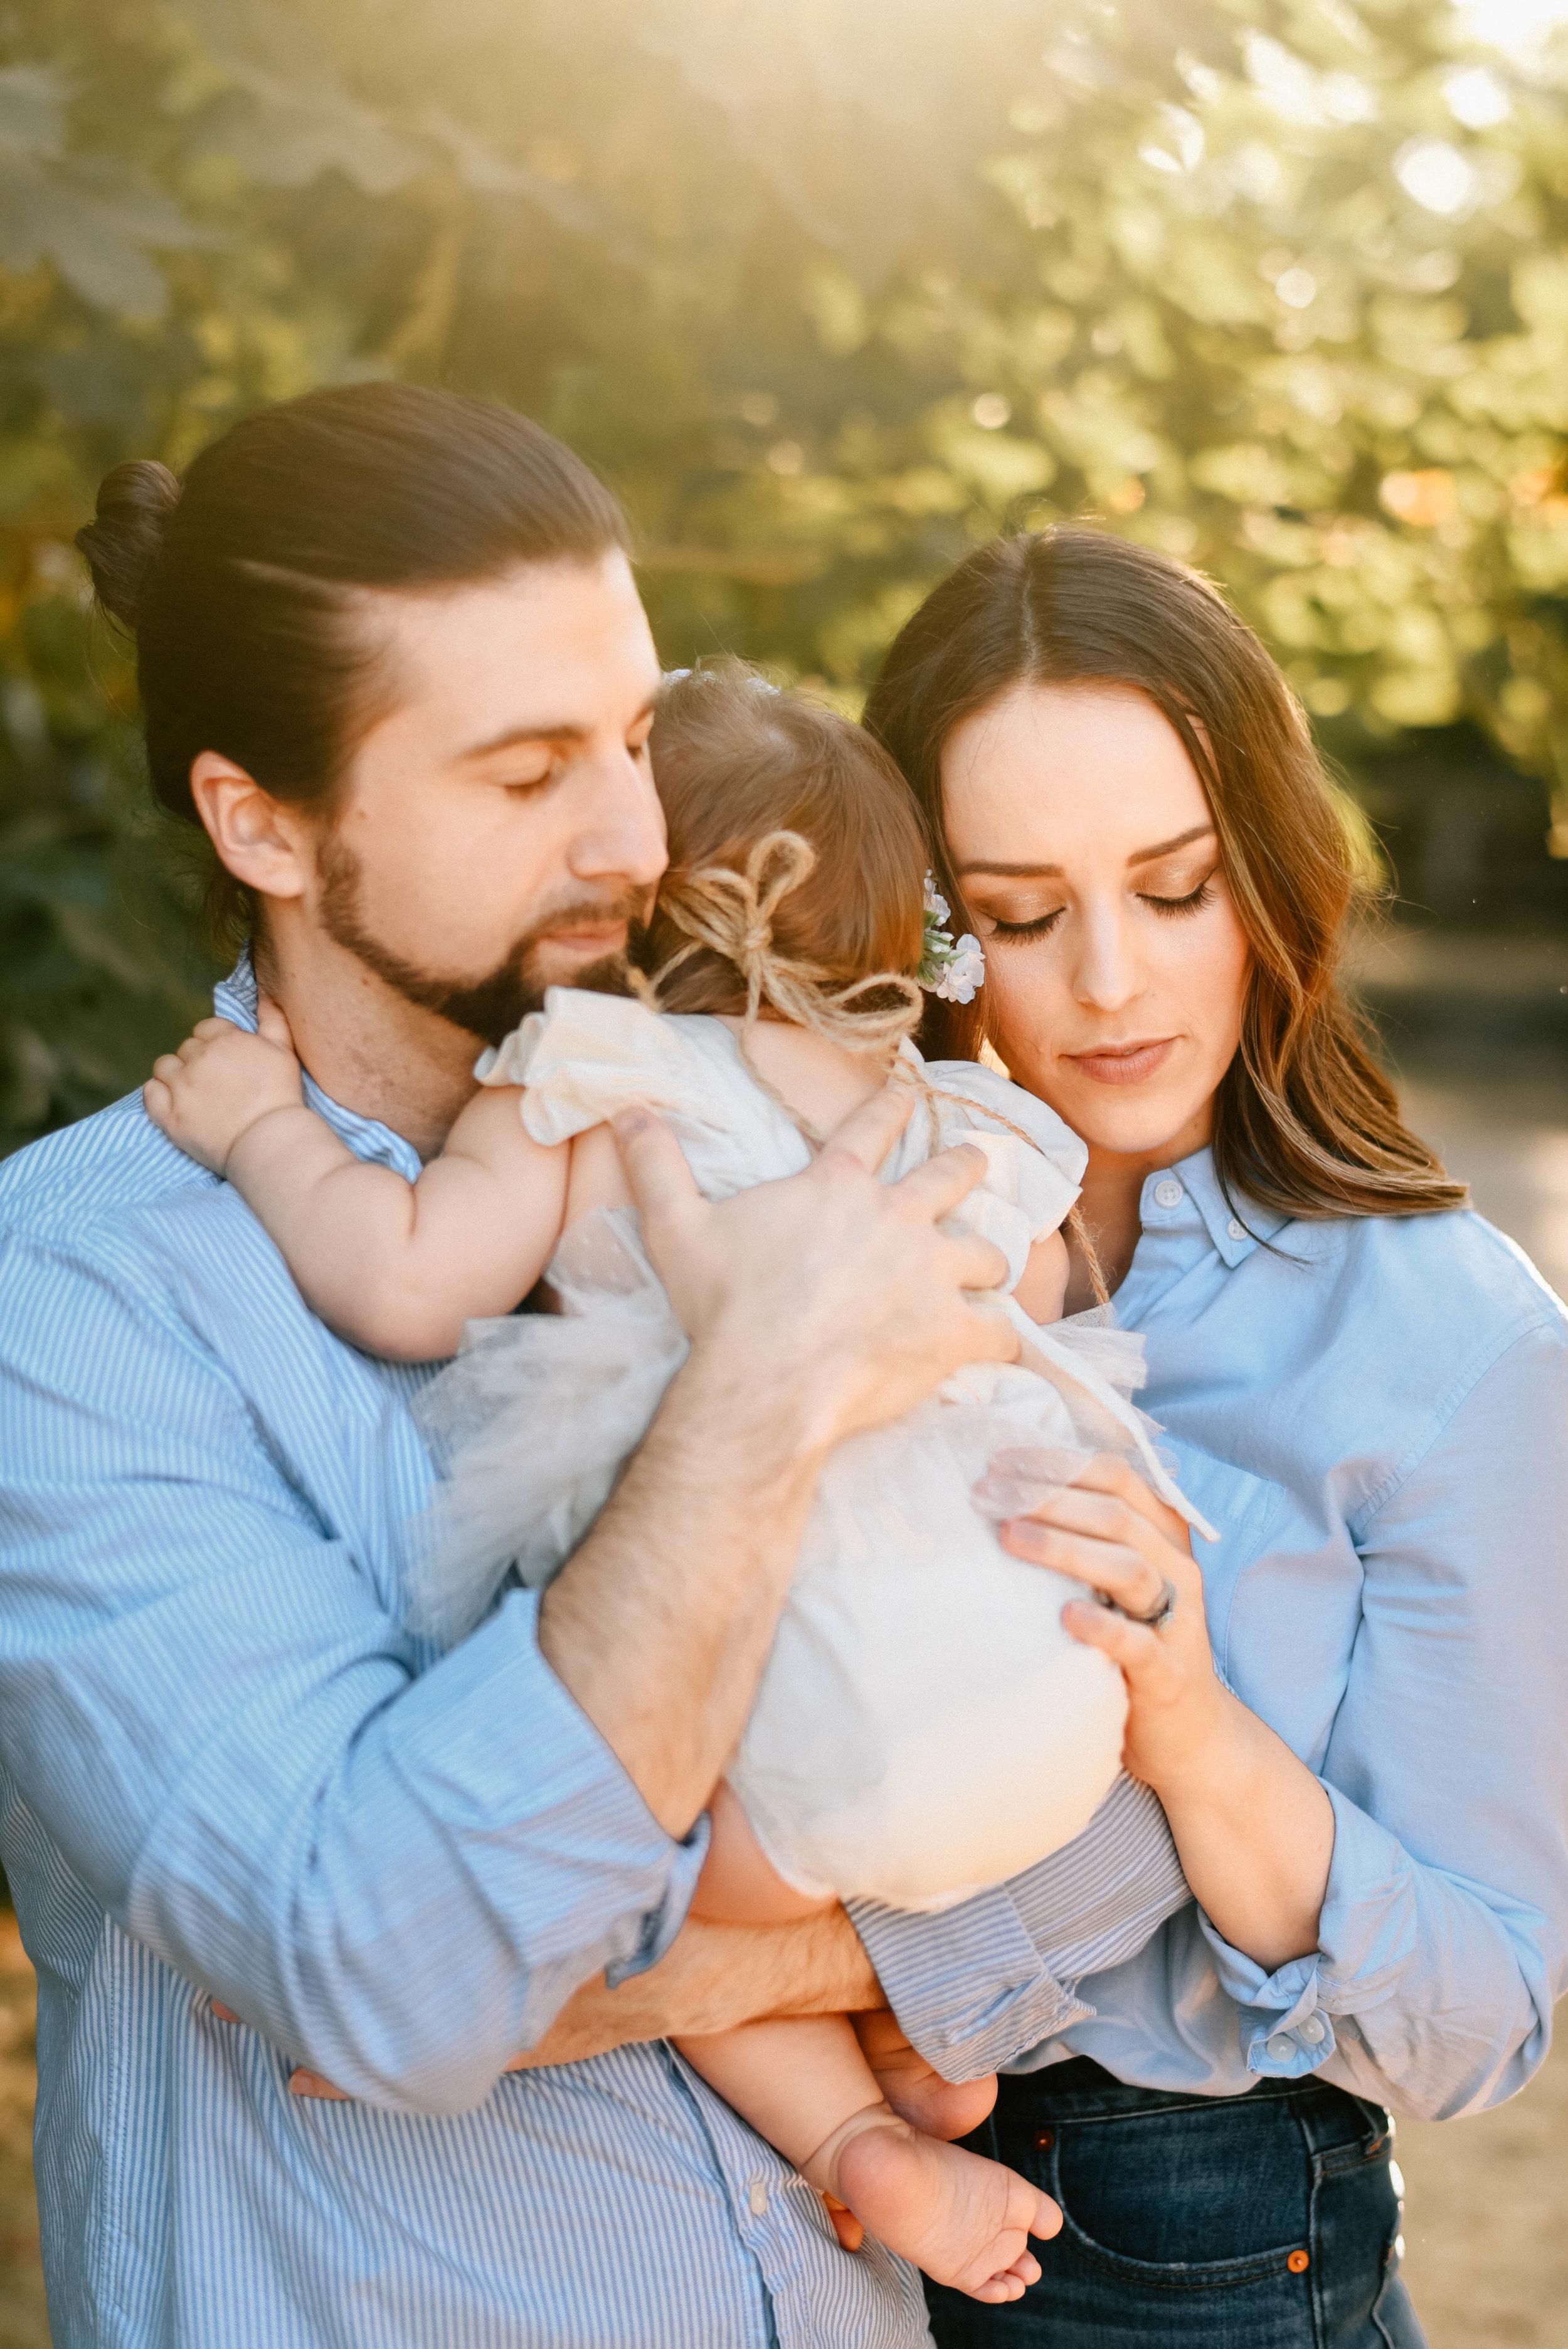 alyssajoyner+family-69.jpg